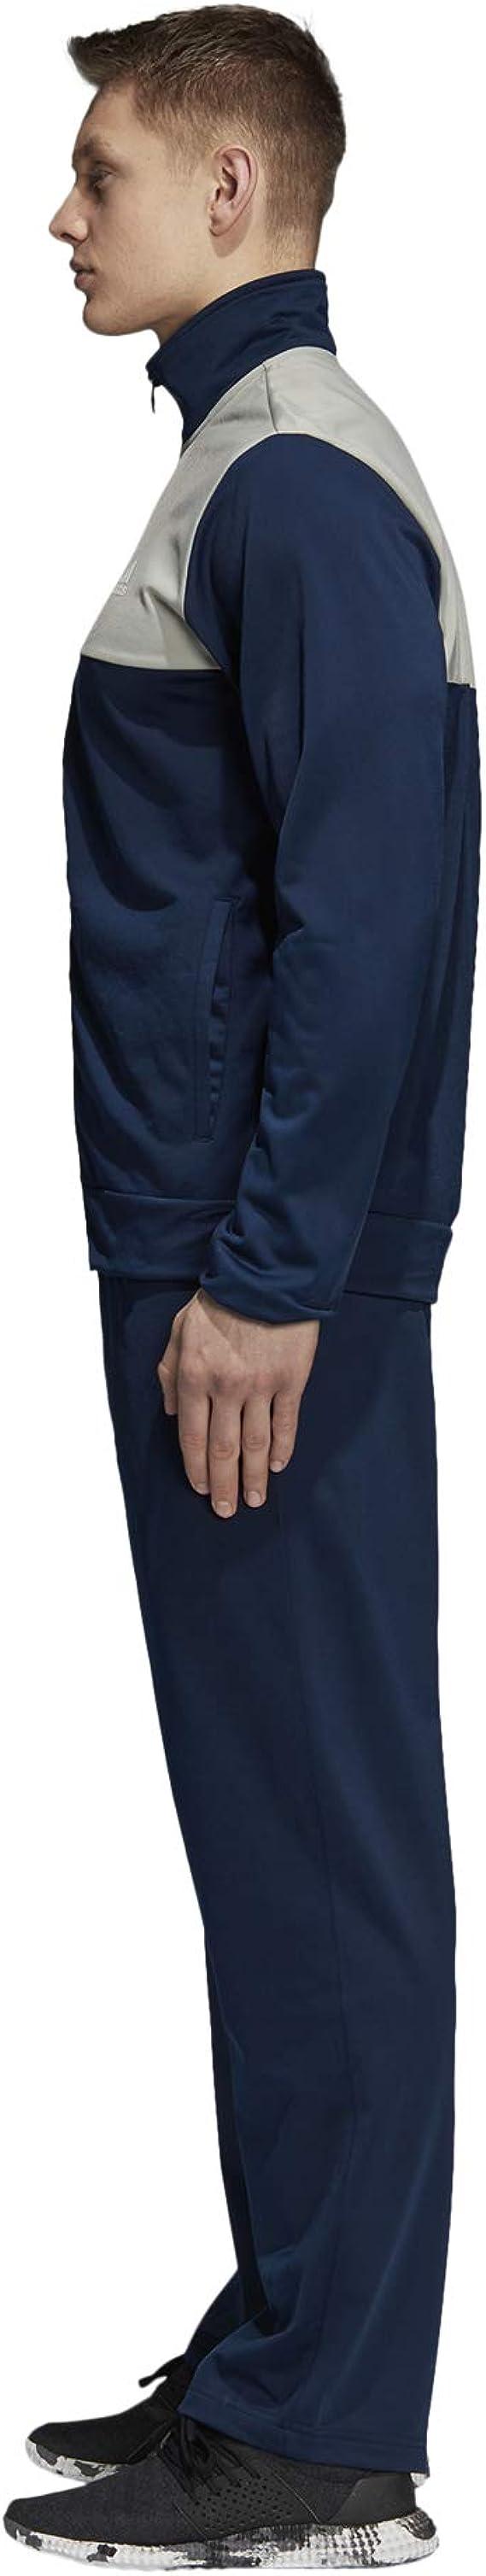 Tesoro Solenoide diferencia  adidas Back2Basics Ts Conavy/Ashsil Sportswear Clothing